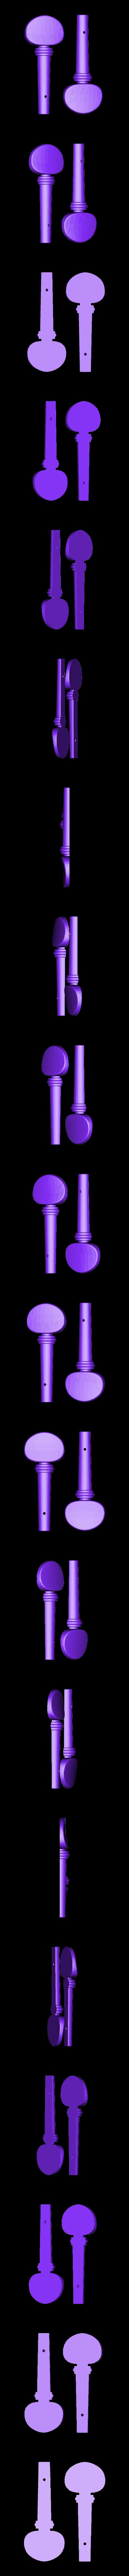 16b-peg-split.stl Download free STL file Violin • 3D print design, jteix